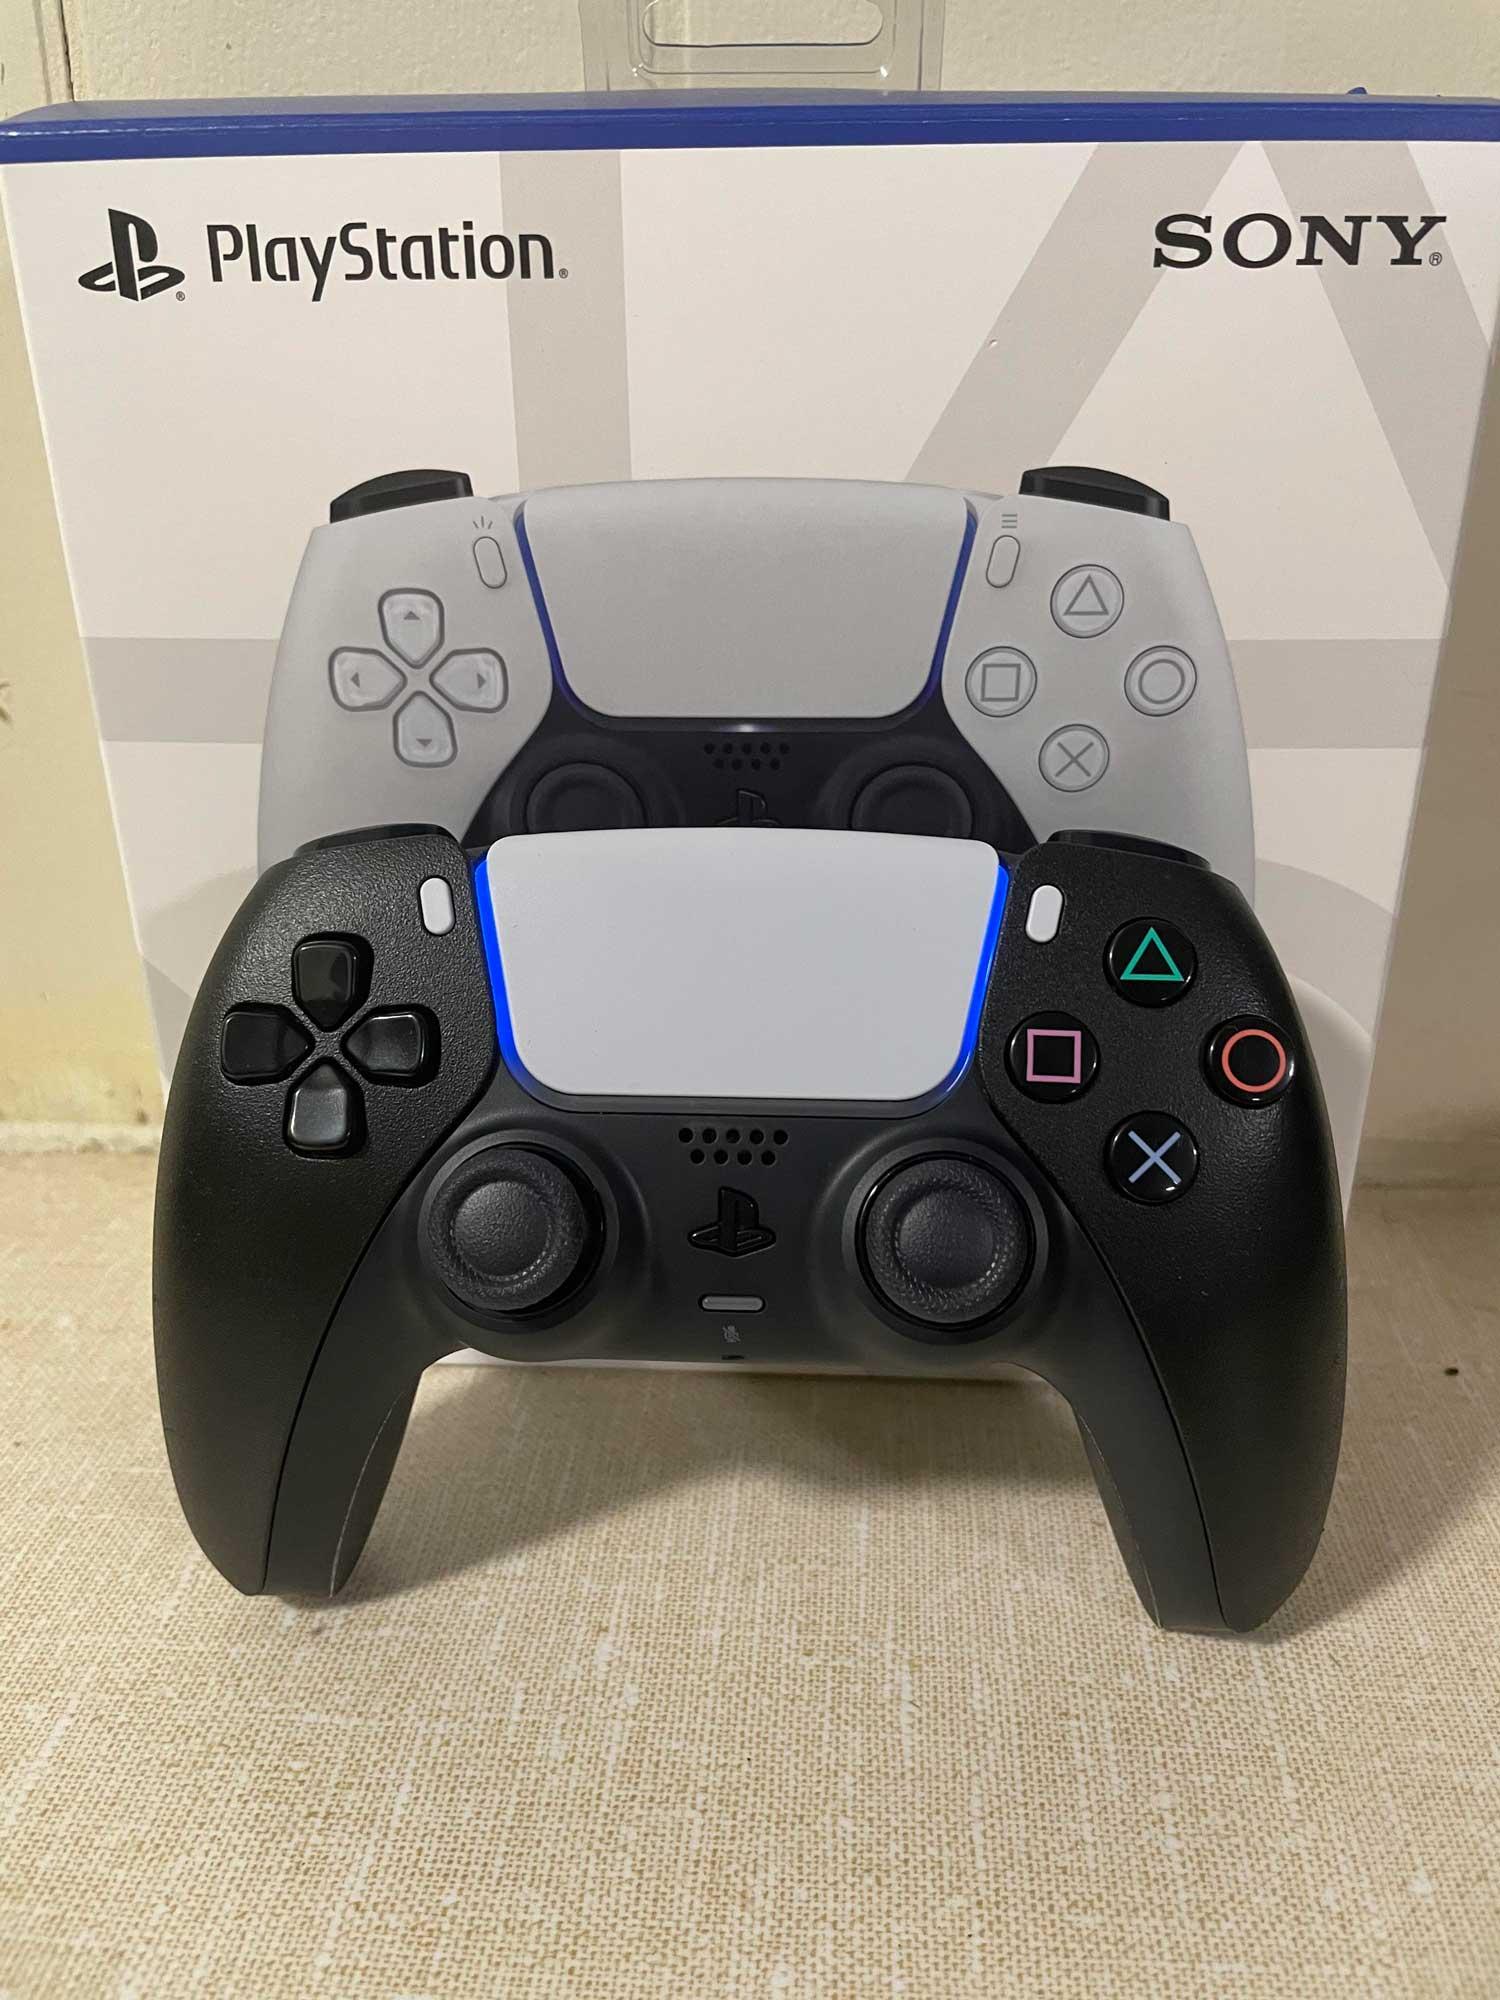 PS5 DualSense PS5 DualShock 4